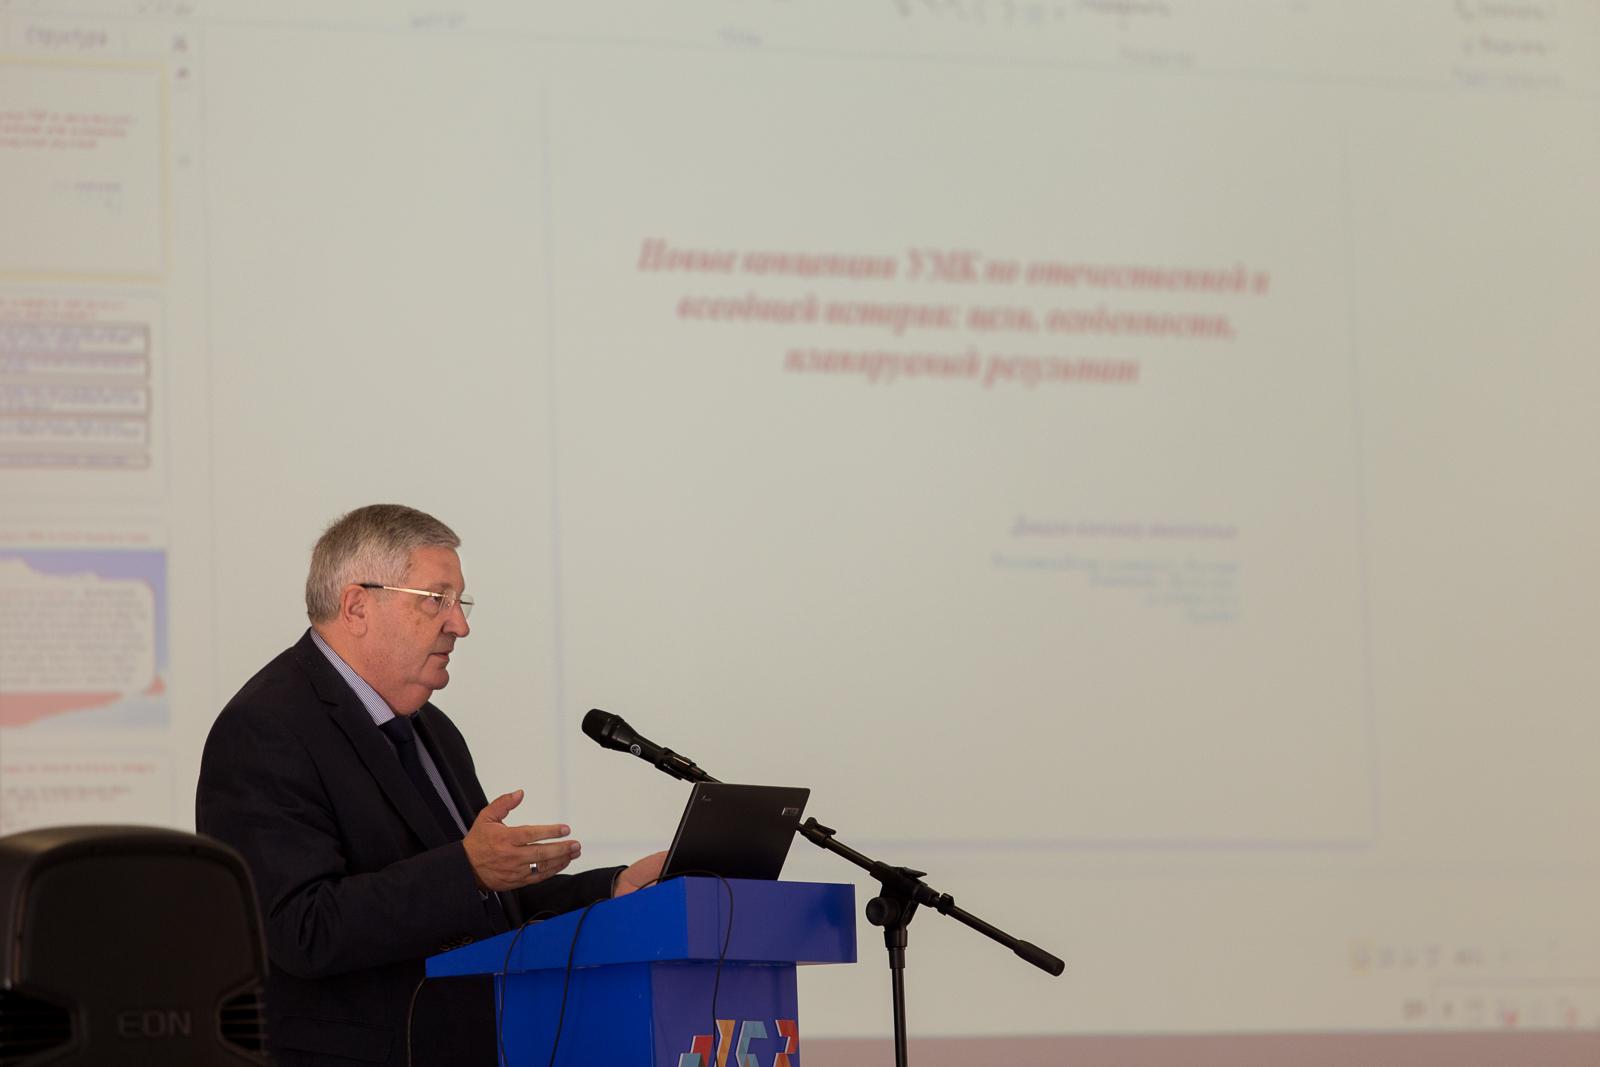 Д.и.н., профессор, автор учебника по истории Александр Данилов.